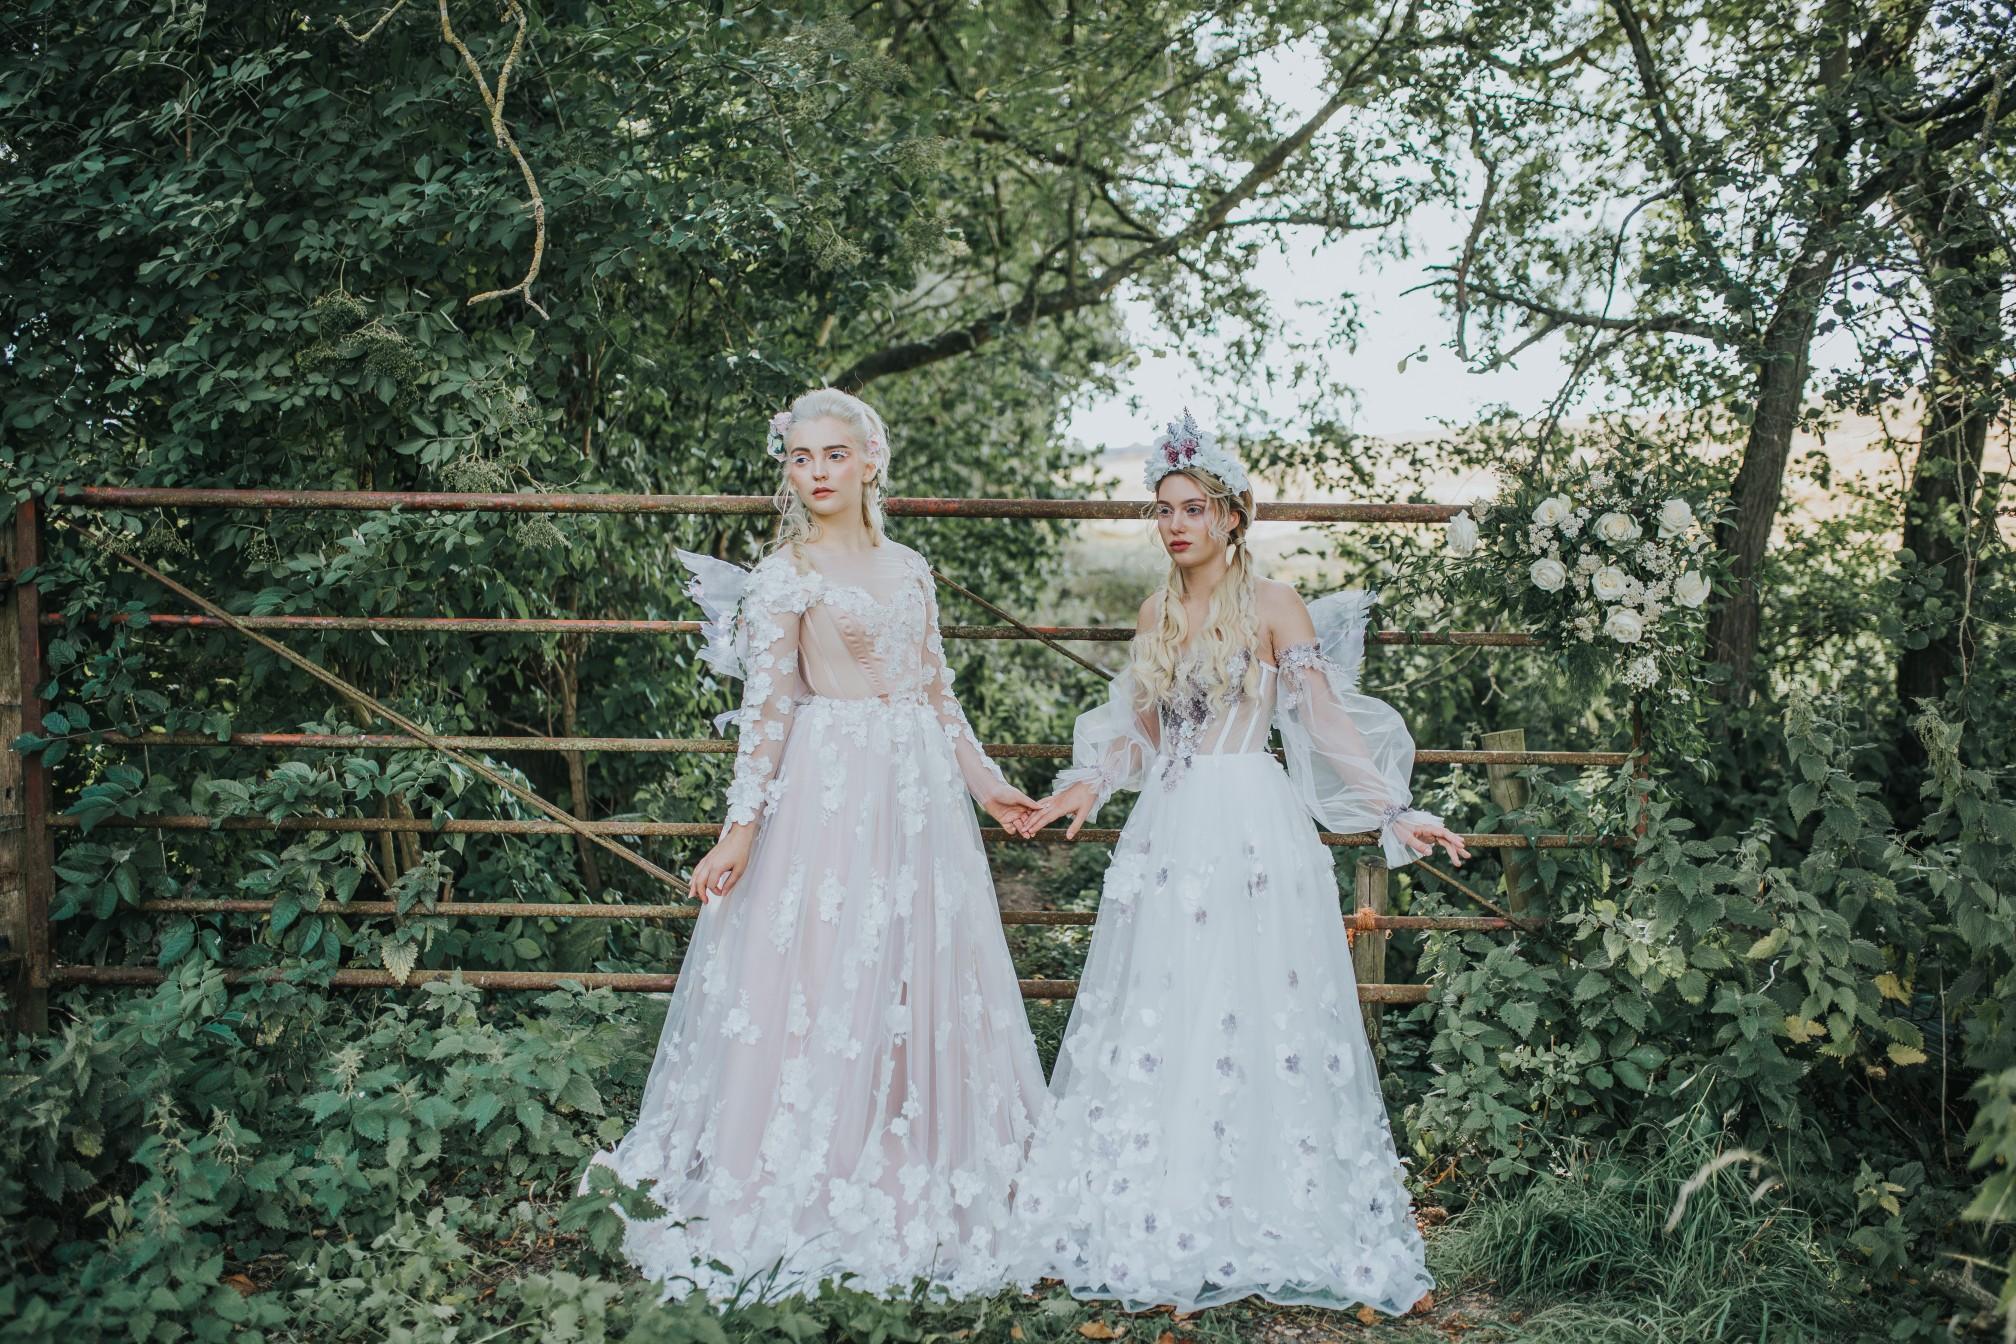 fairy wedding - whimsical wedding - magical wedding - elegant wedding dress - detailed wedding dresses